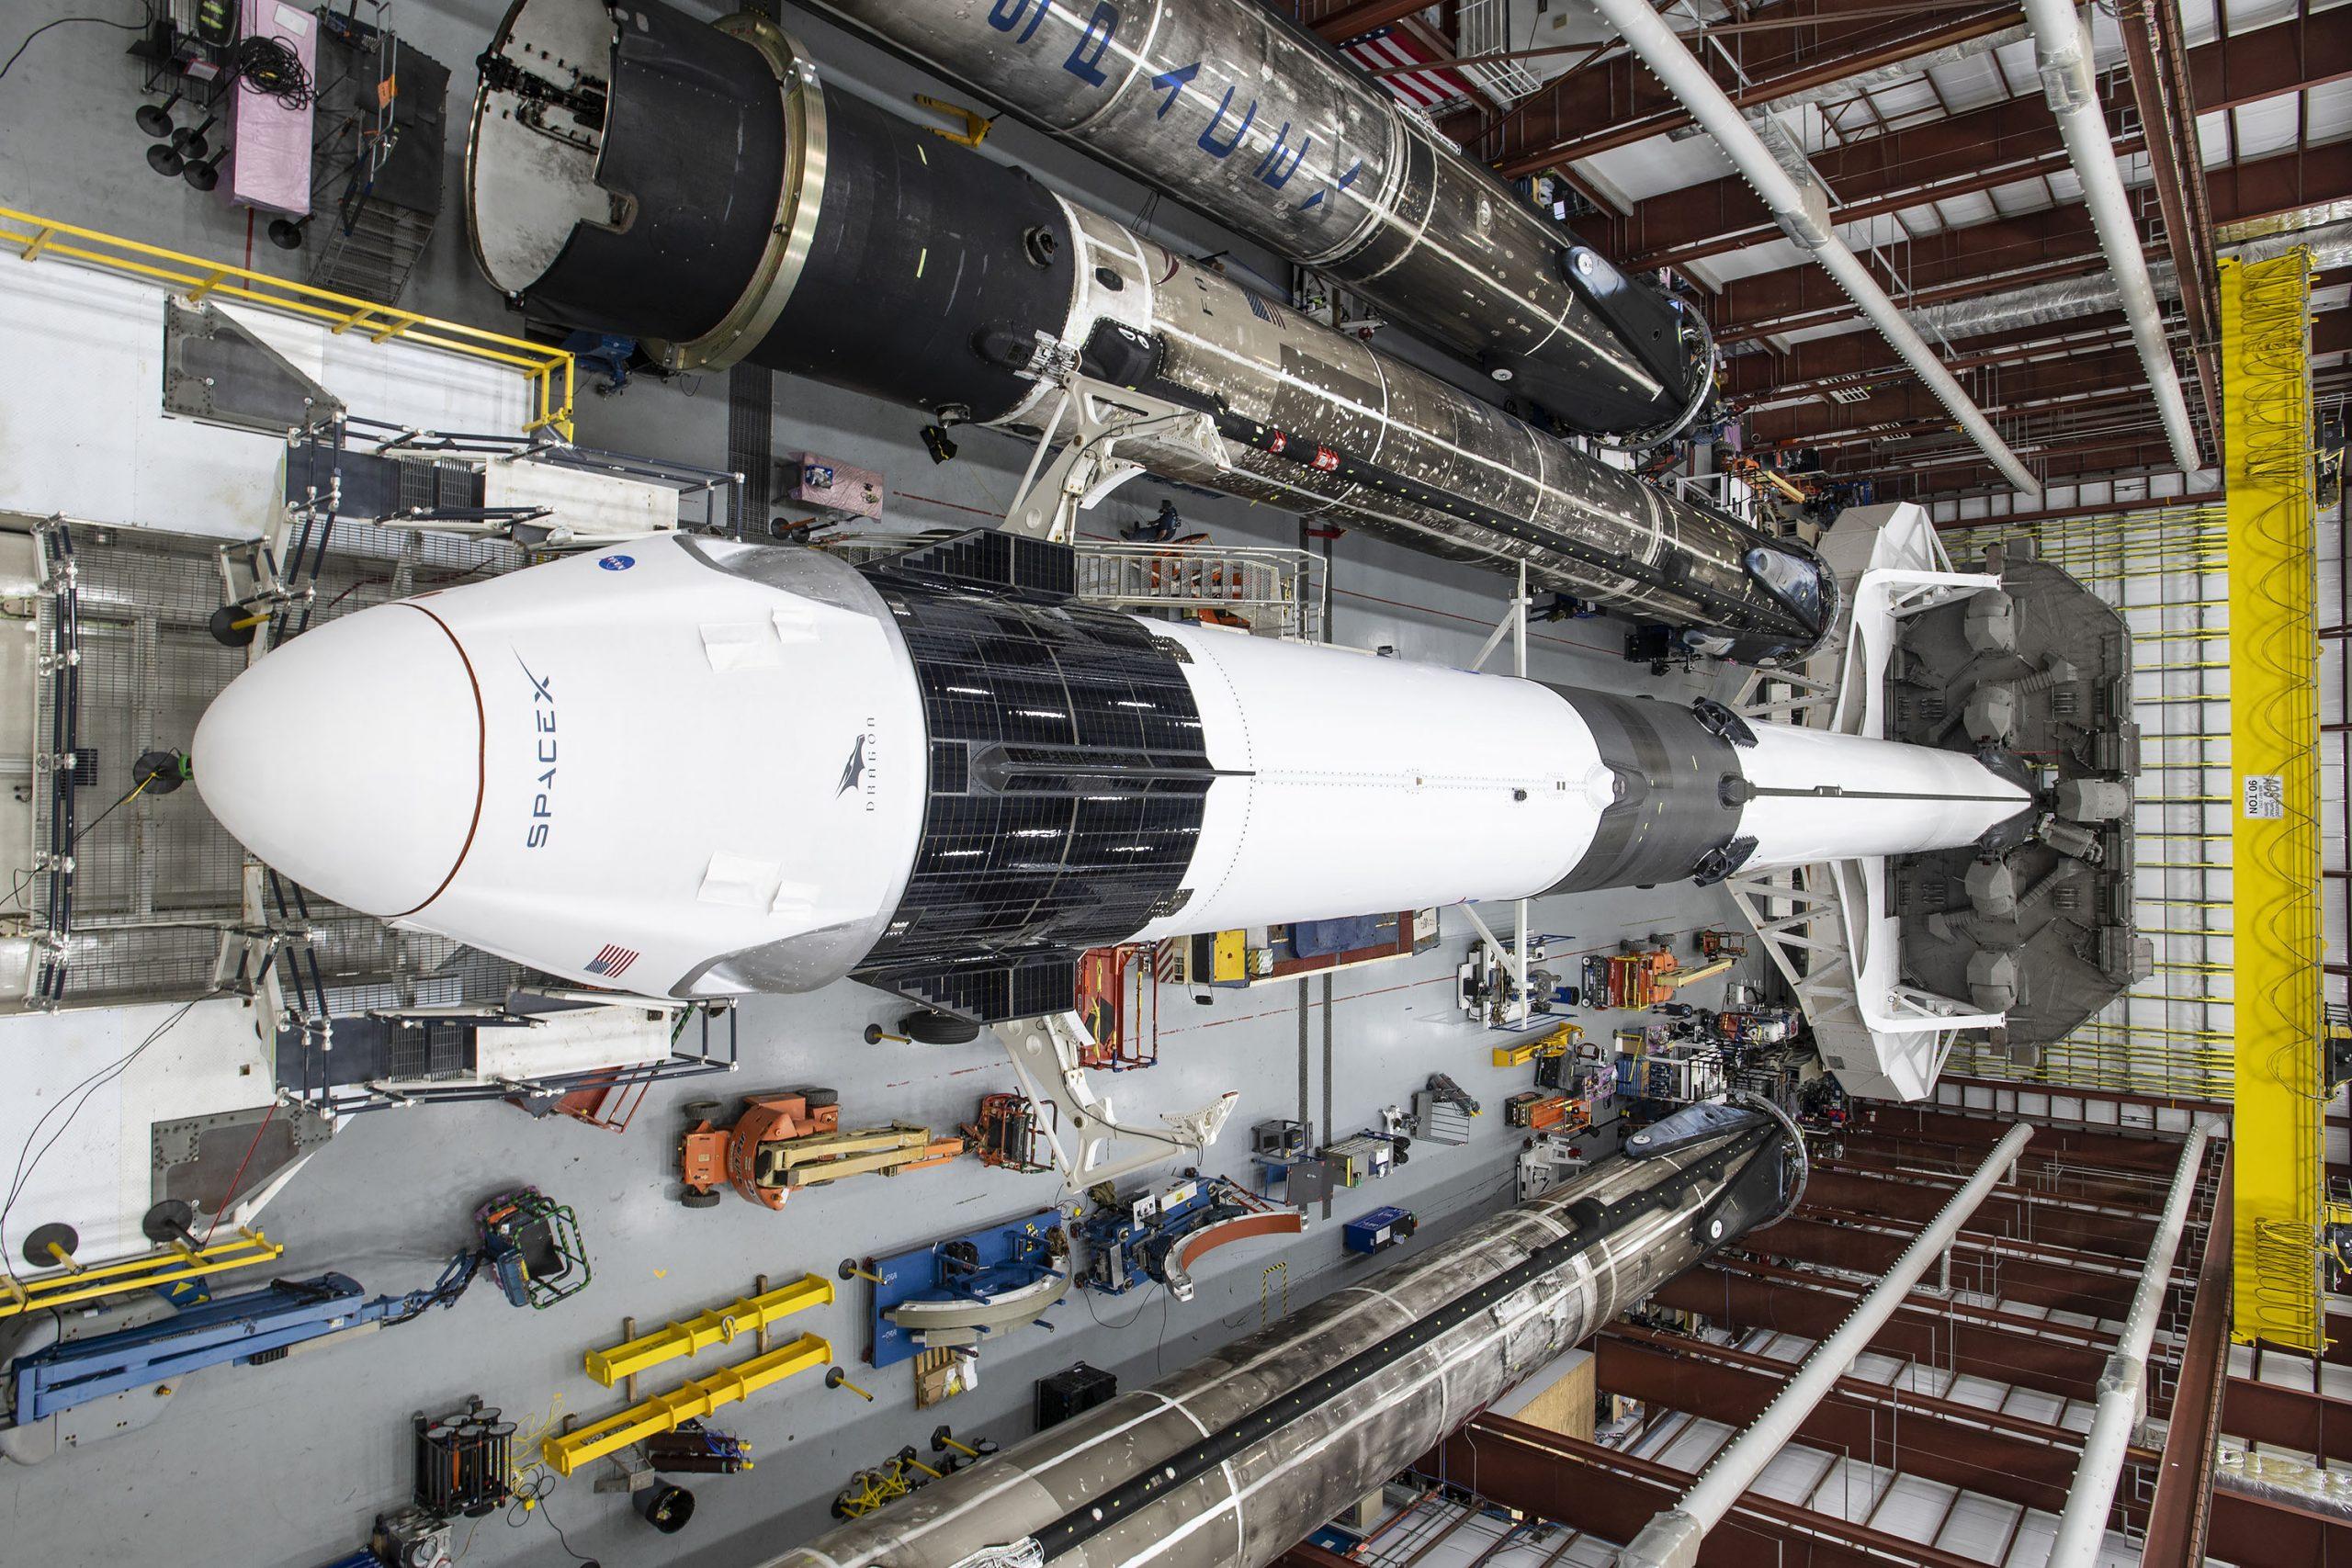 Crew-1 Crew Dragon C207 Falcon 9 B1061 39A 110820 (SpaceX) B1049 B1058 1